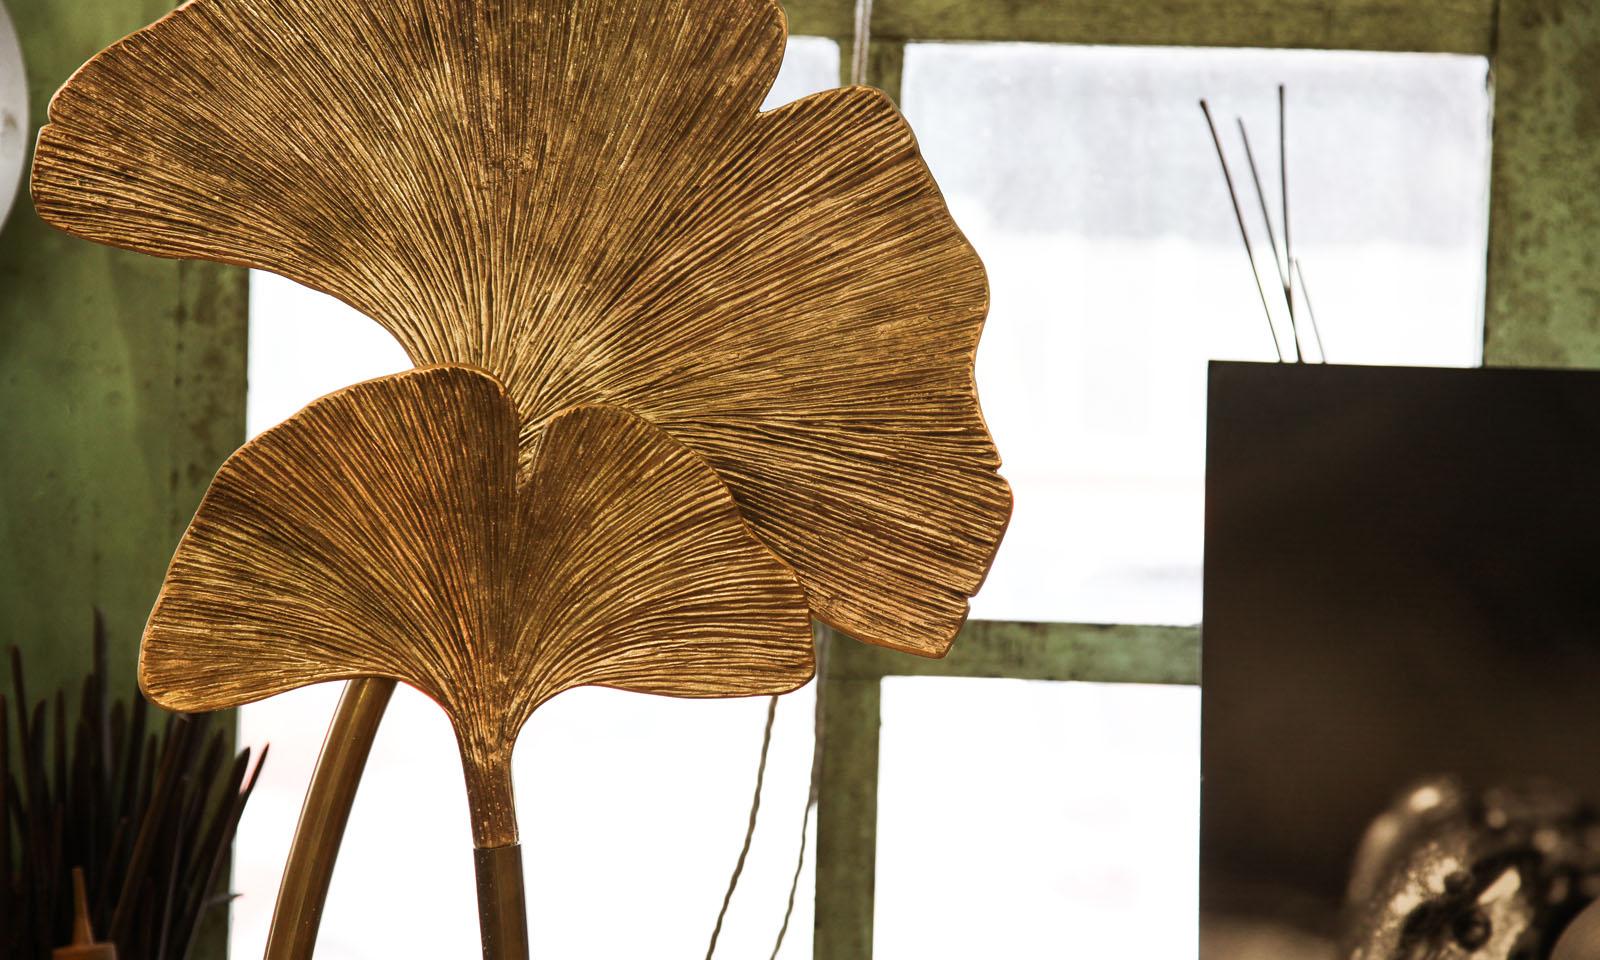 visite tr s priv e dans l 39 antre de la c l bre maison charles the socialite family. Black Bedroom Furniture Sets. Home Design Ideas